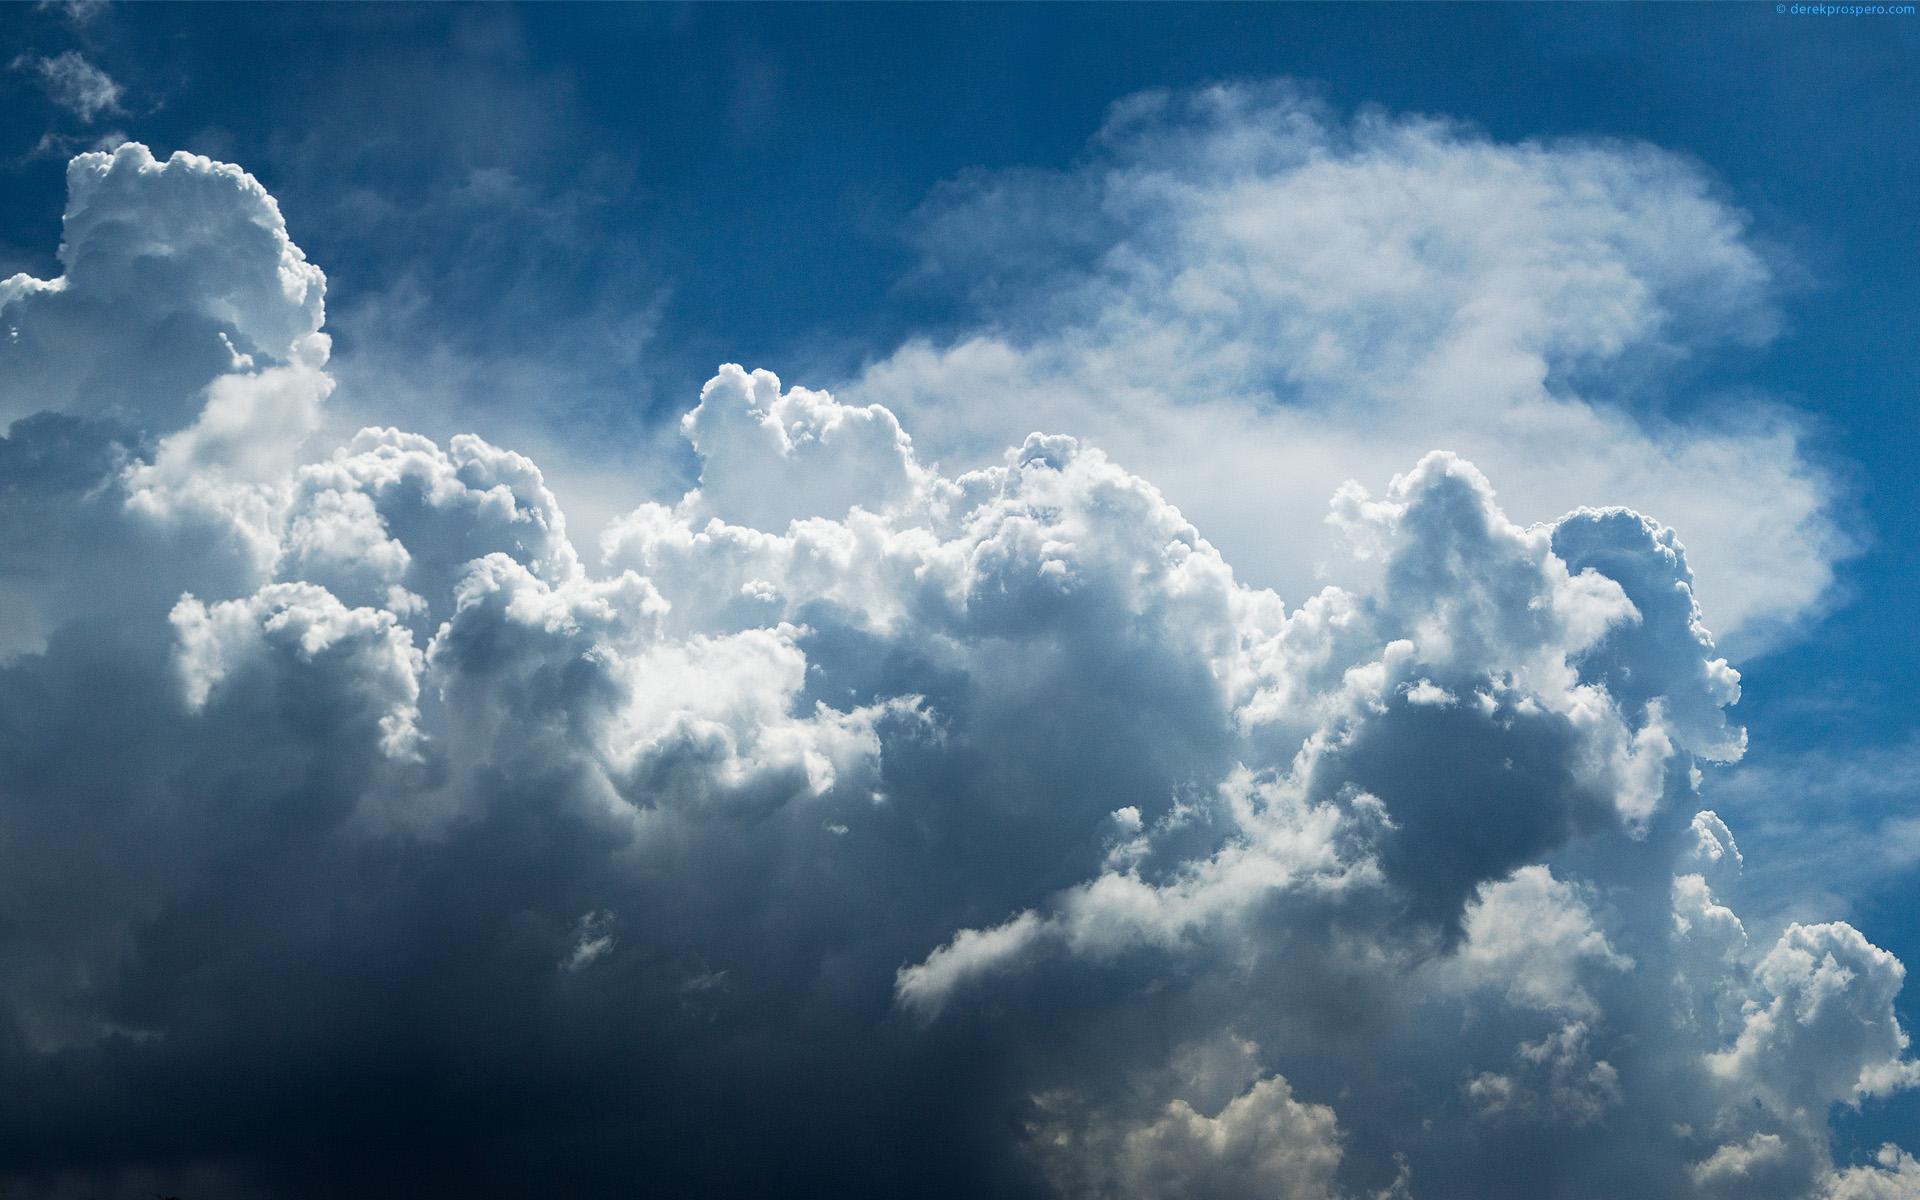 cloud Wallpaper Background 23448 1920x1200